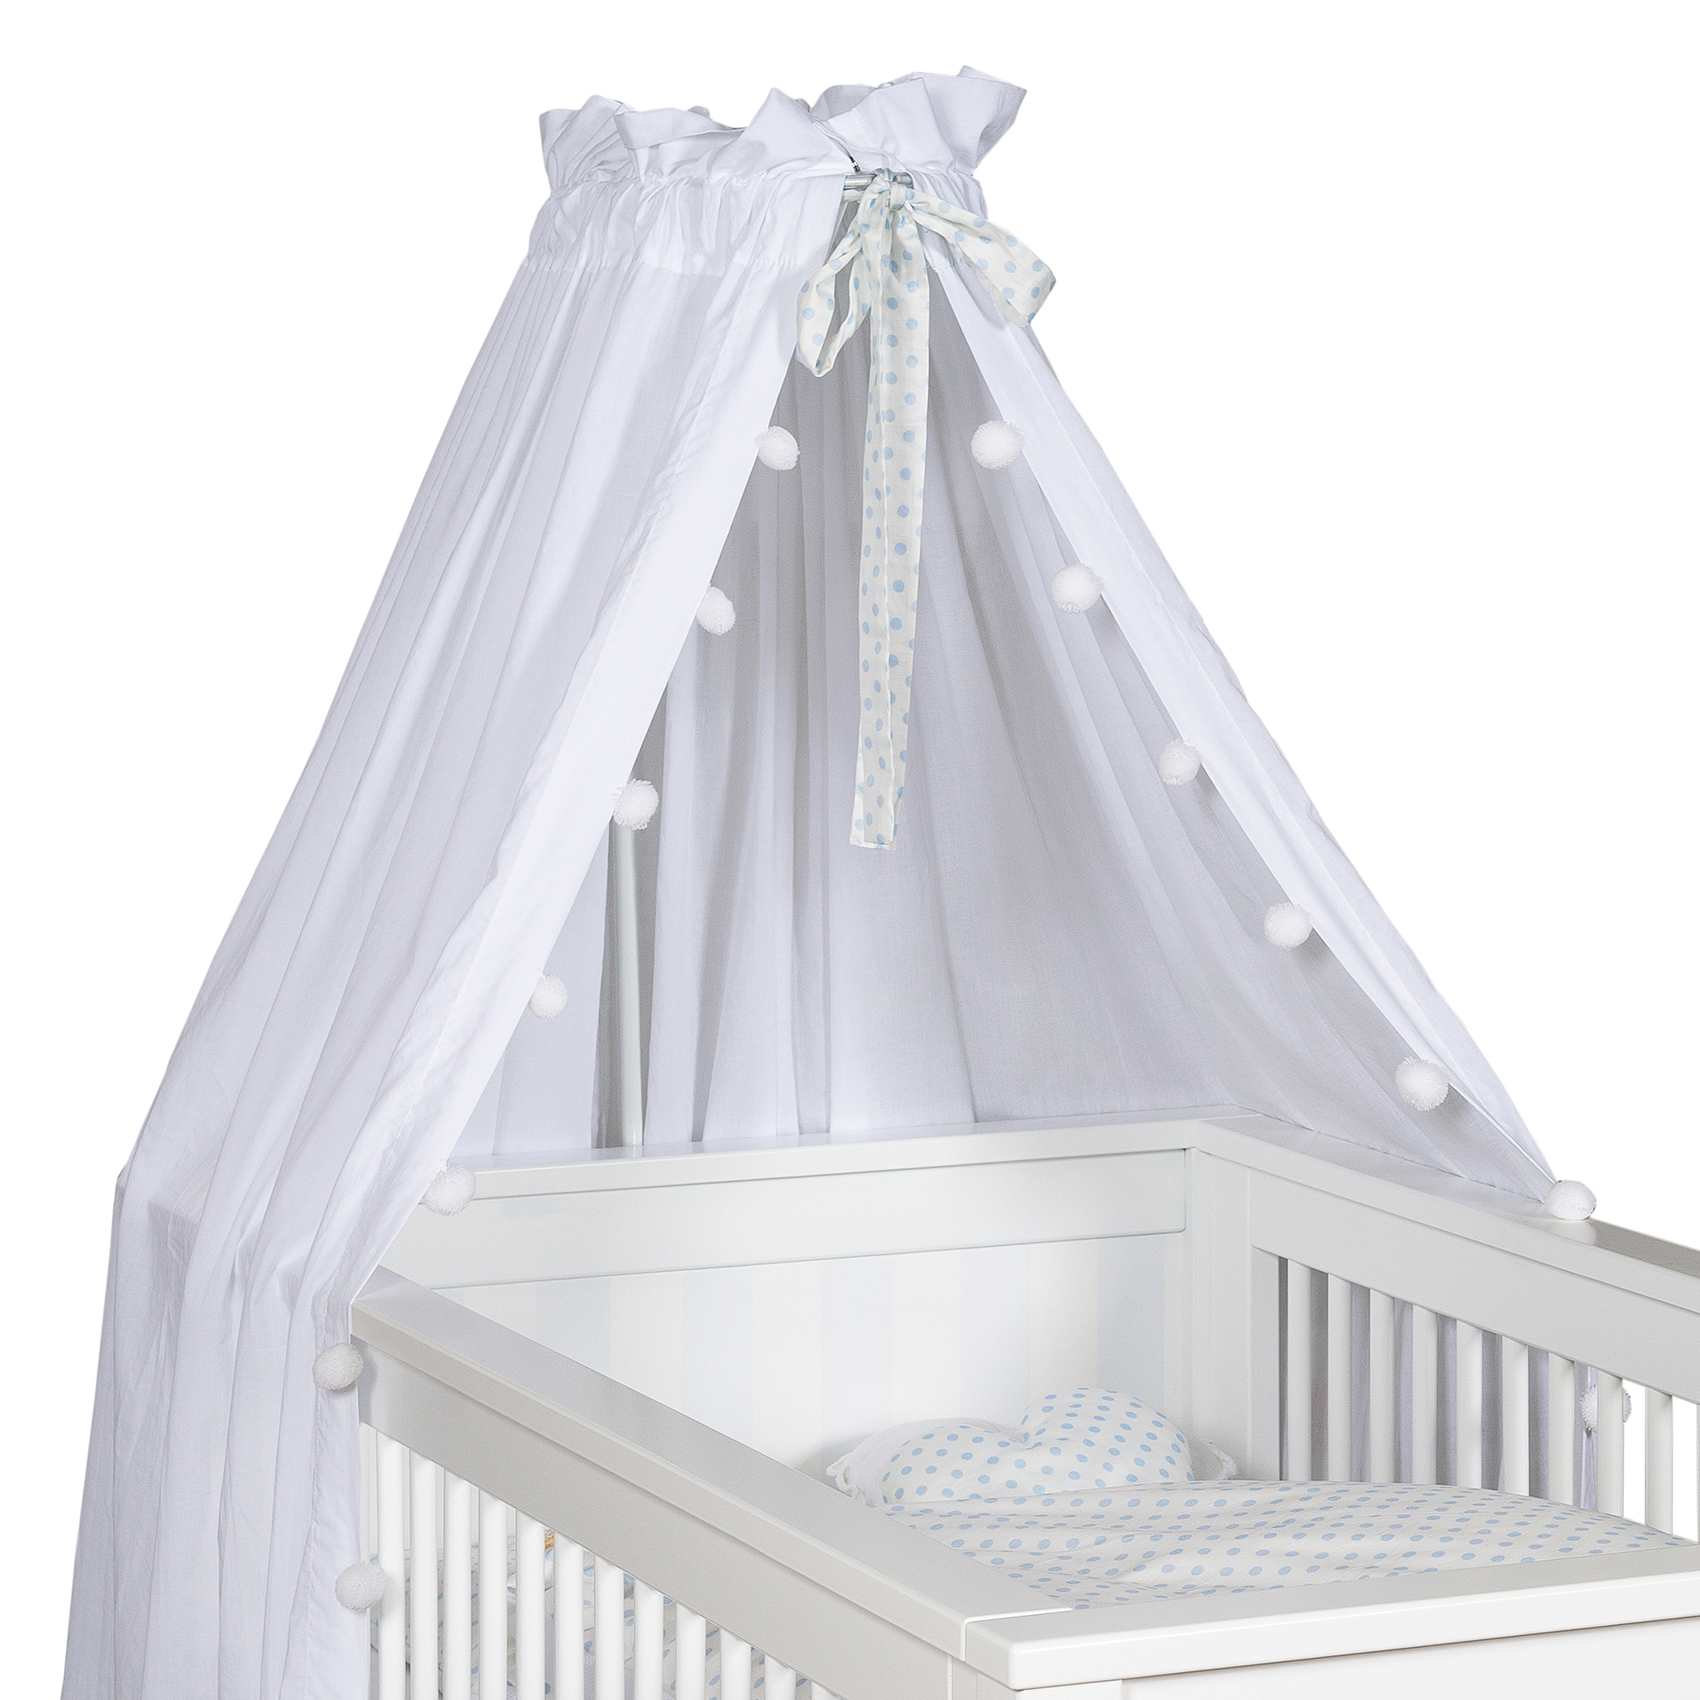 Babybett Himmel 'Pompon' weiß